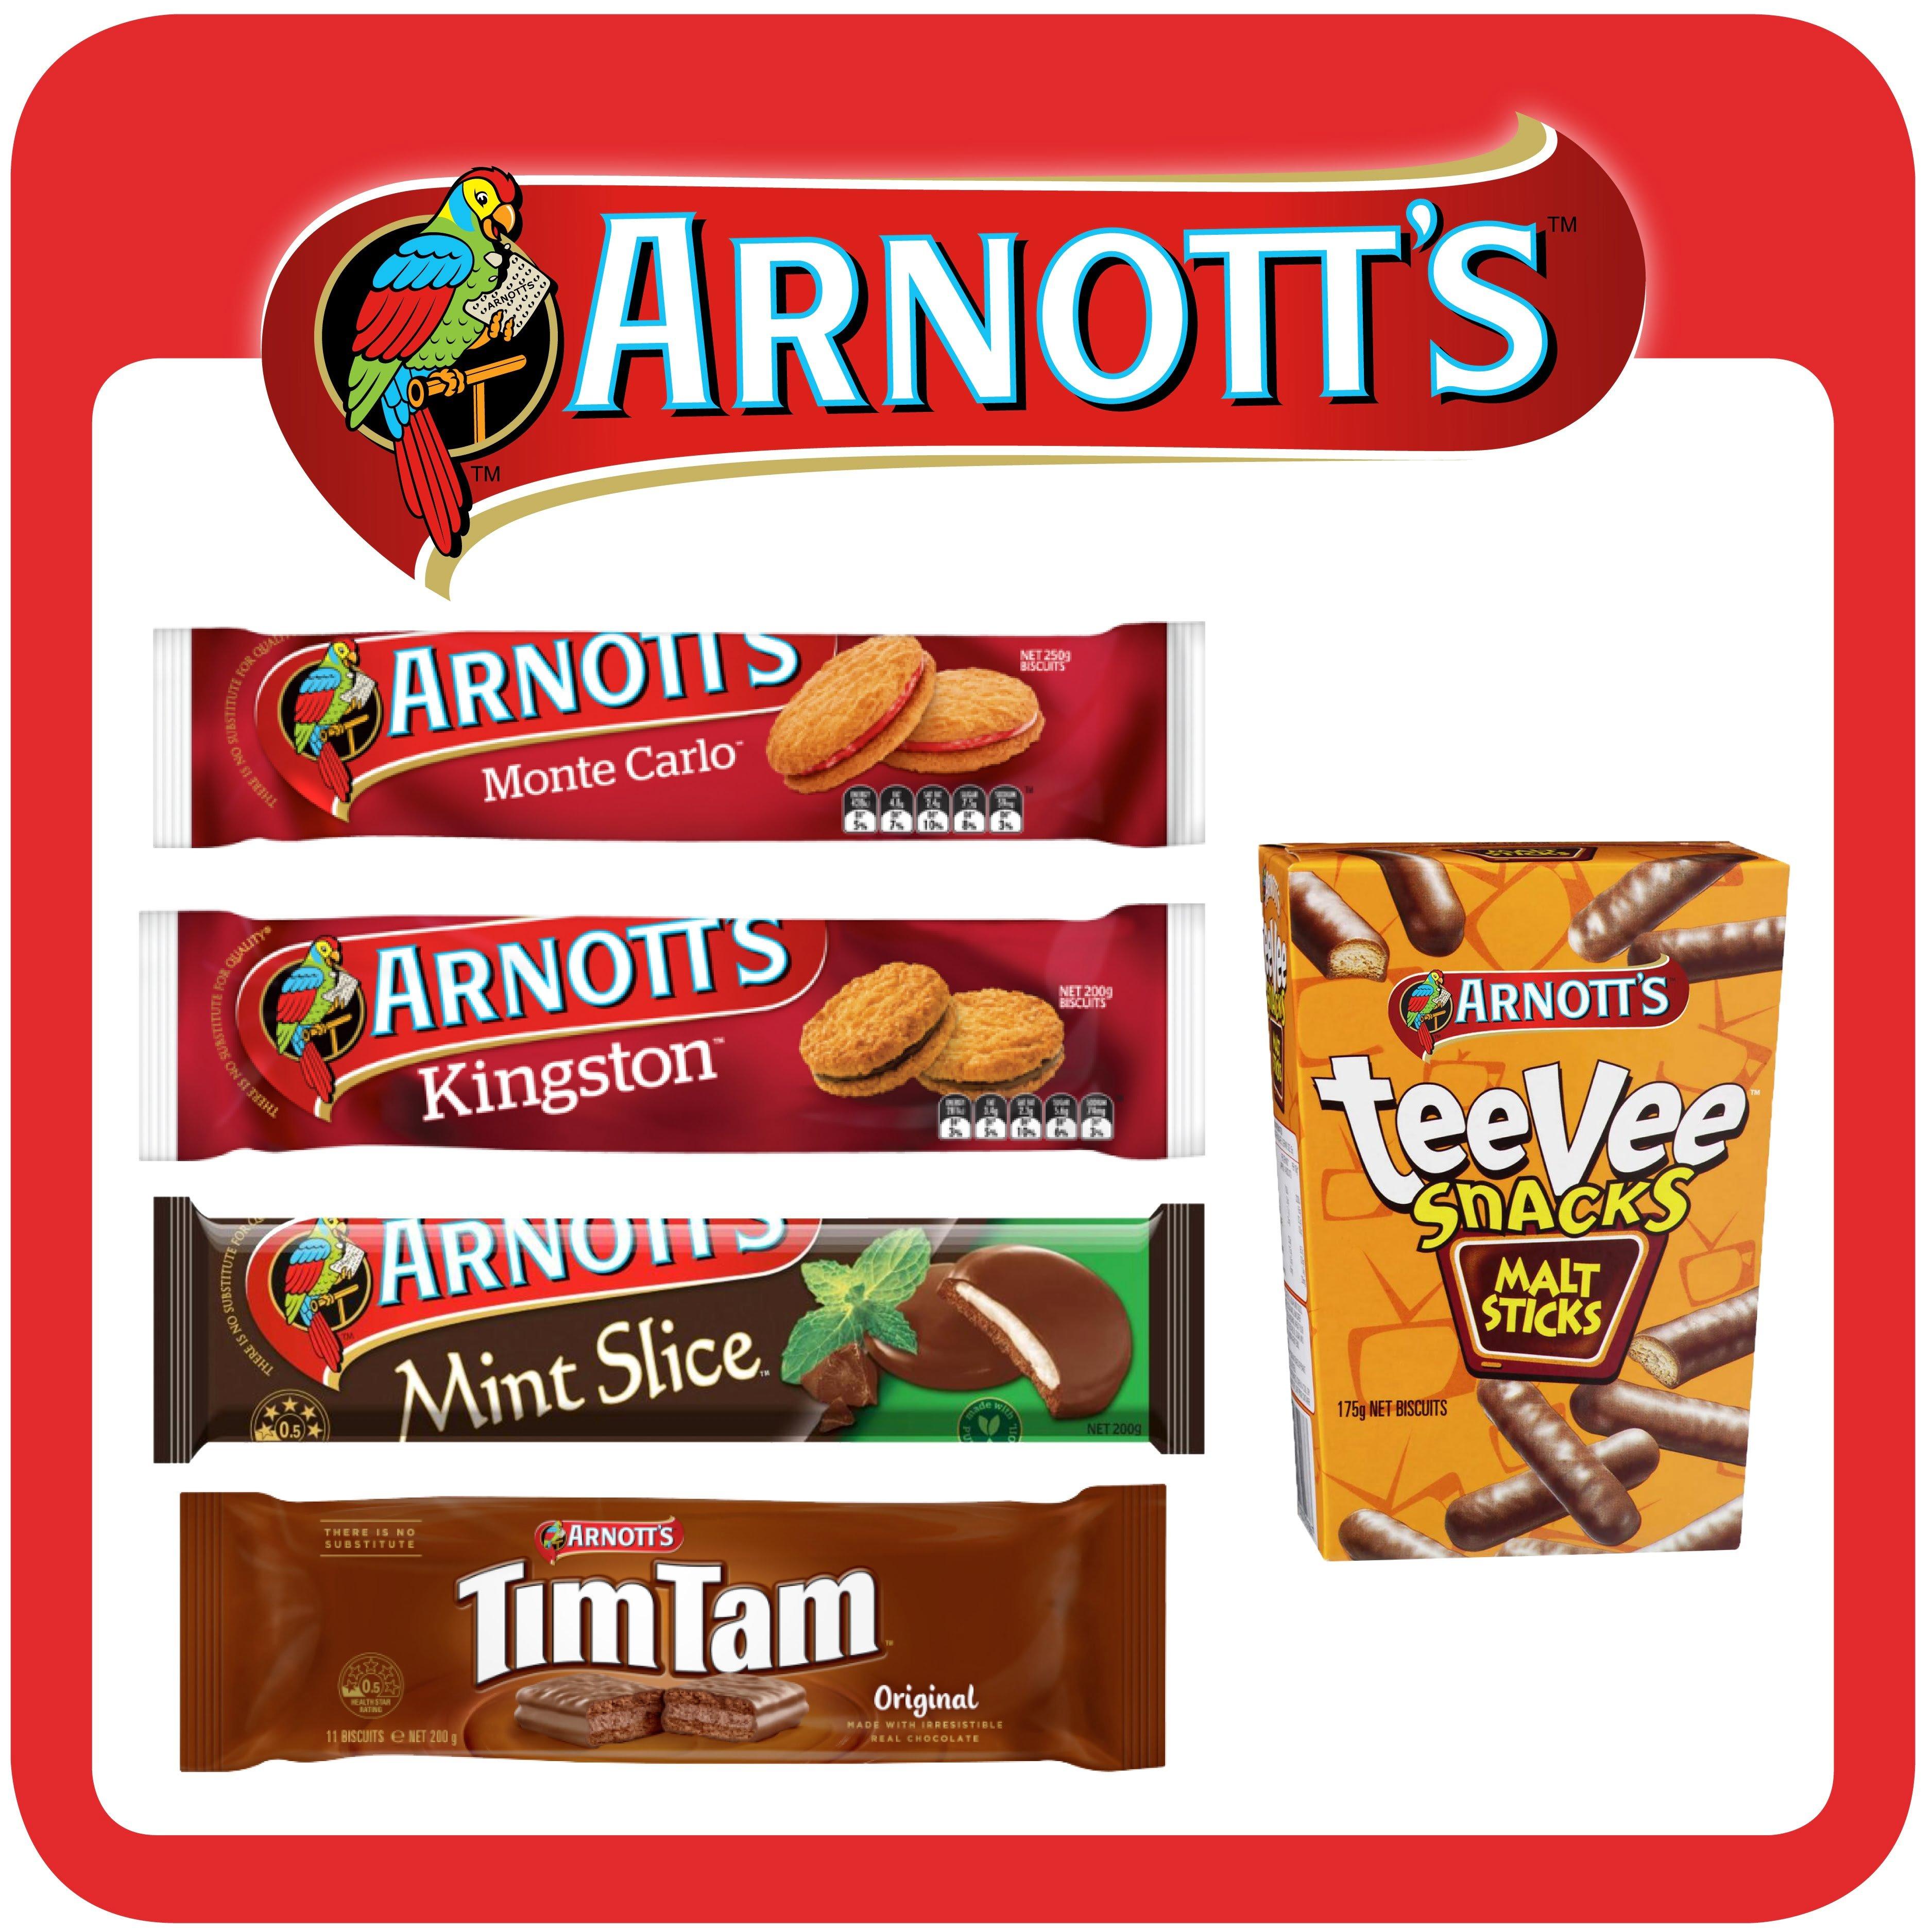 Arnotts_2020_Website_900x900-Arnotts